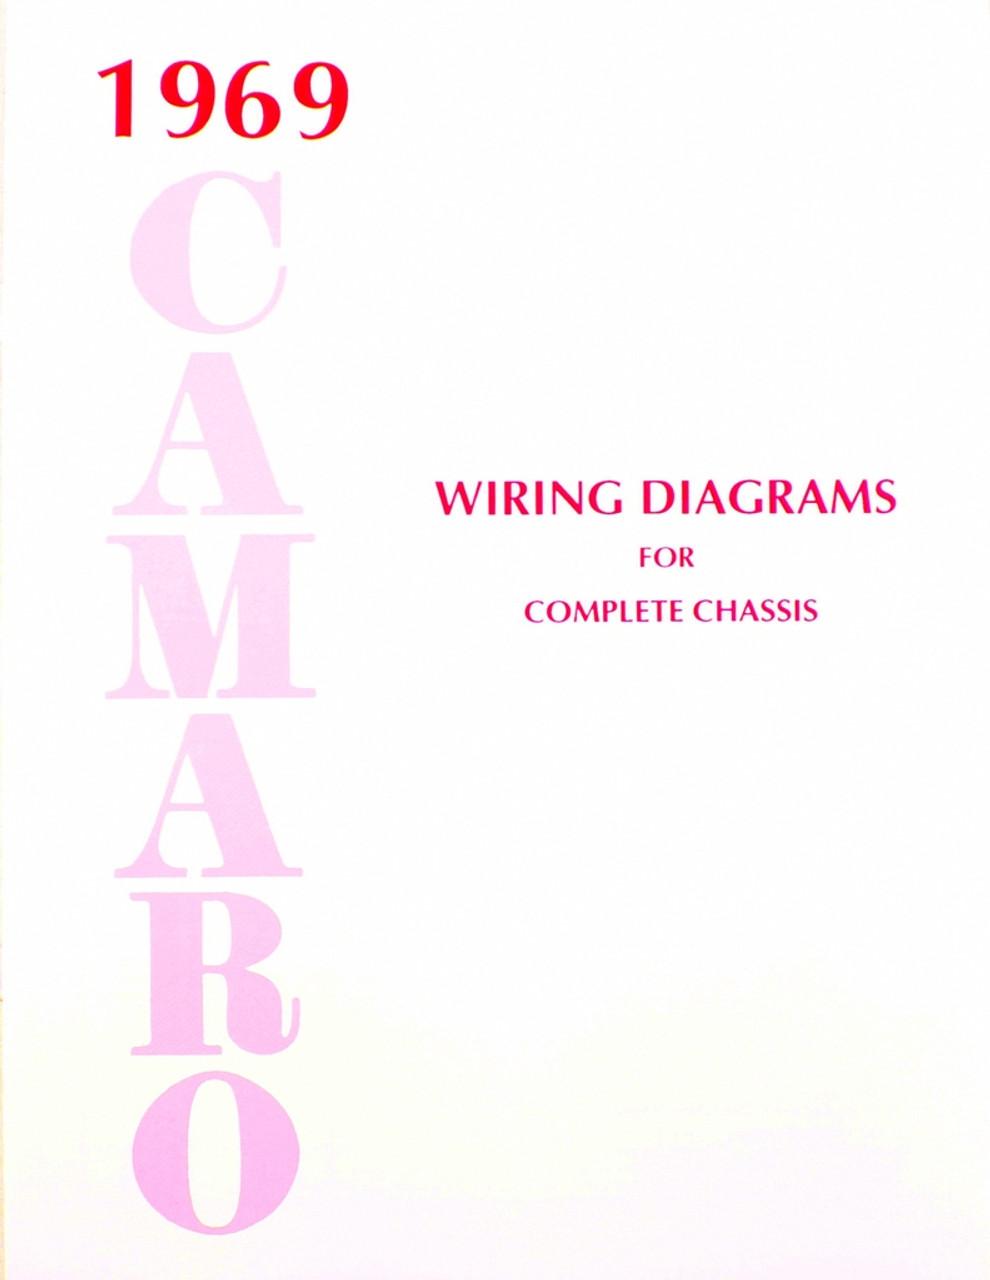 69 chevy camaro electrical wiring diagram manual 1969 i 5 classic 69 chevy camaro electrical wiring diagram manual 1969 swarovskicordoba Gallery